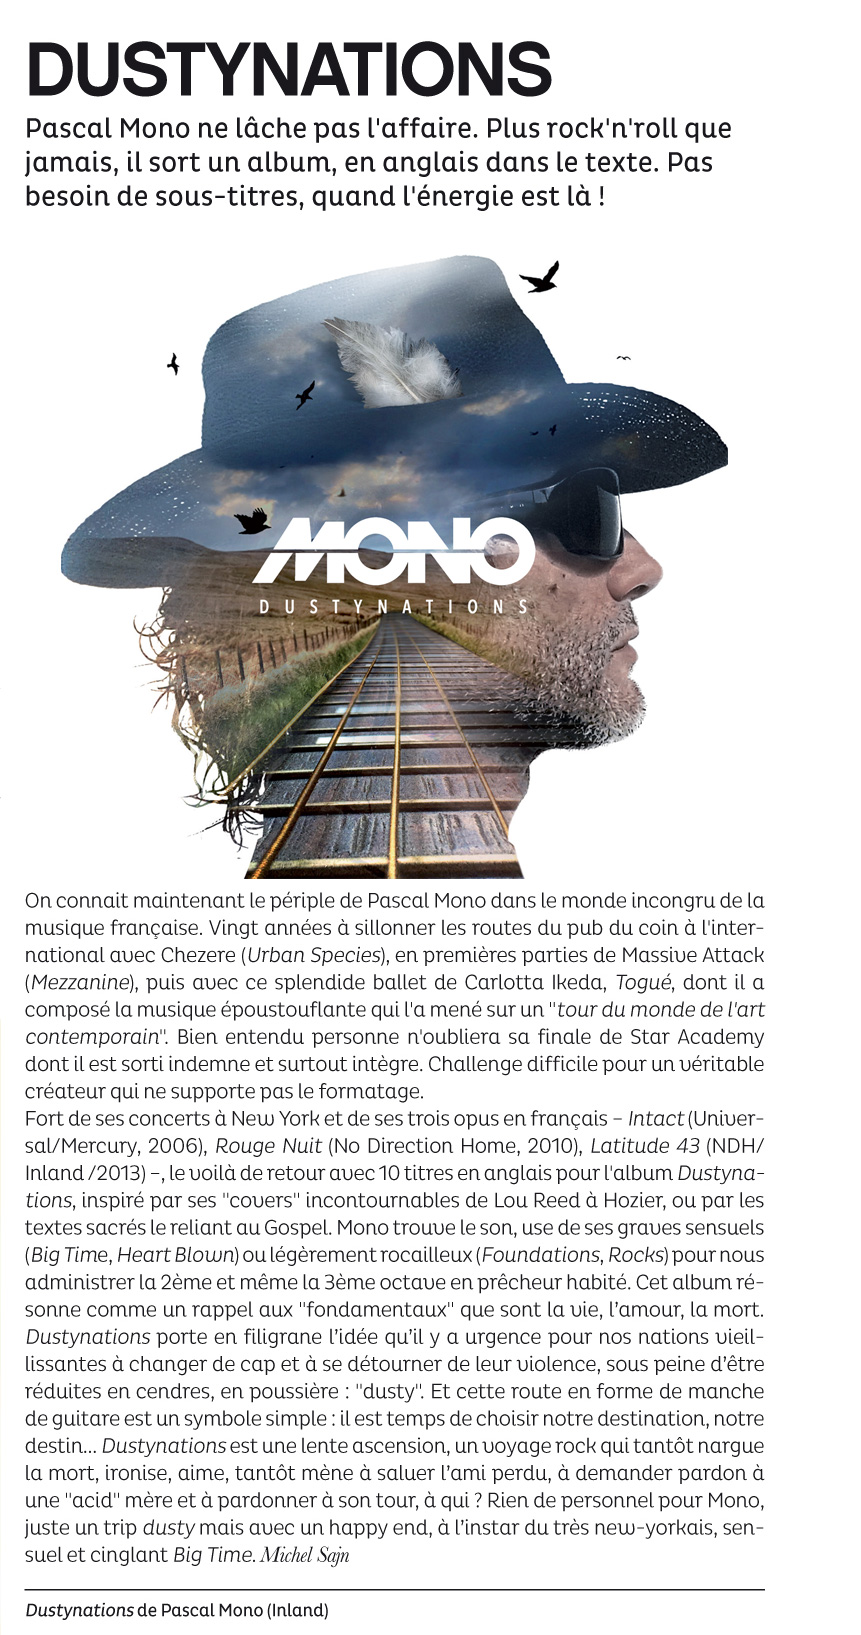 La Strada - Pascal Mono - Dustynations